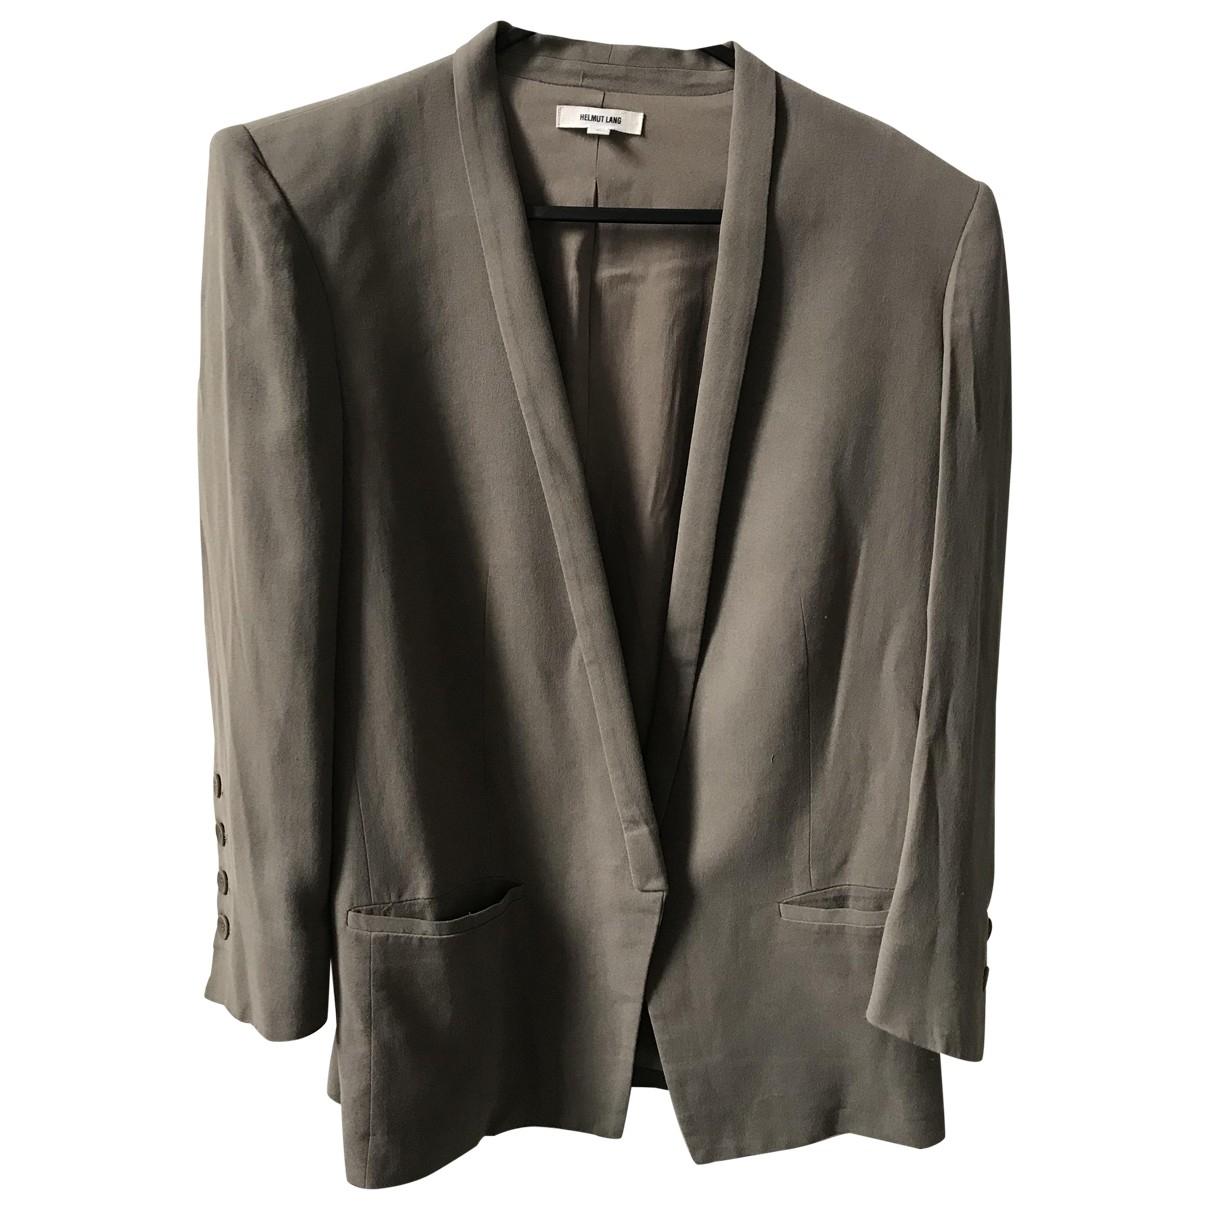 Helmut Lang \N Green jacket for Women 1 US